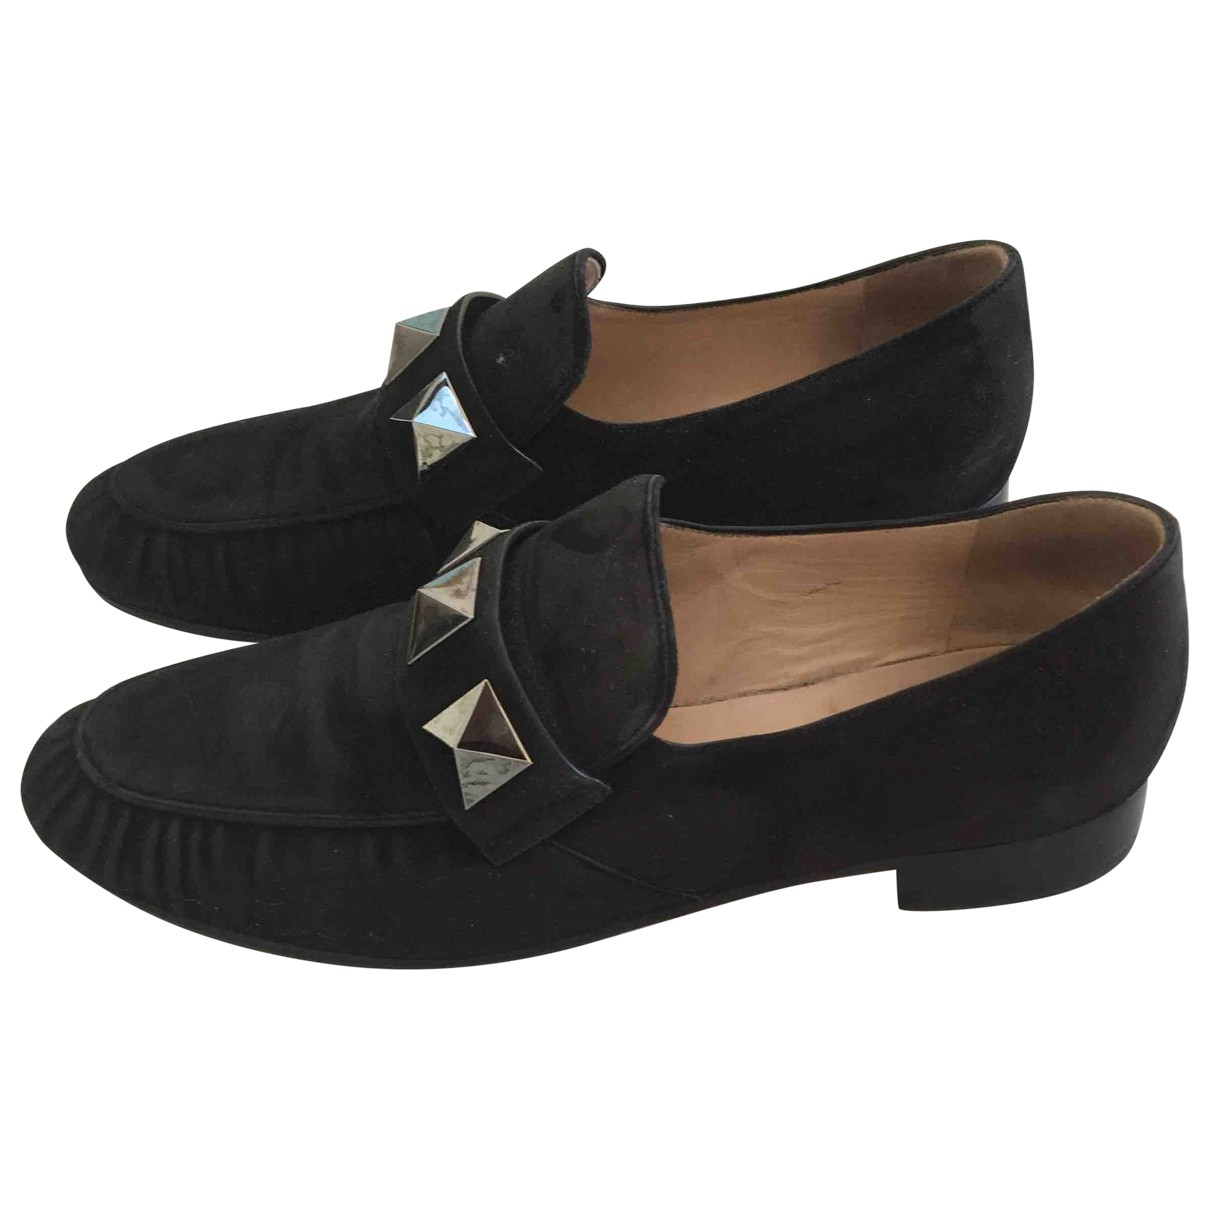 Valentino Garavani Rockstud Black Suede Flats for Women 38.5 EU